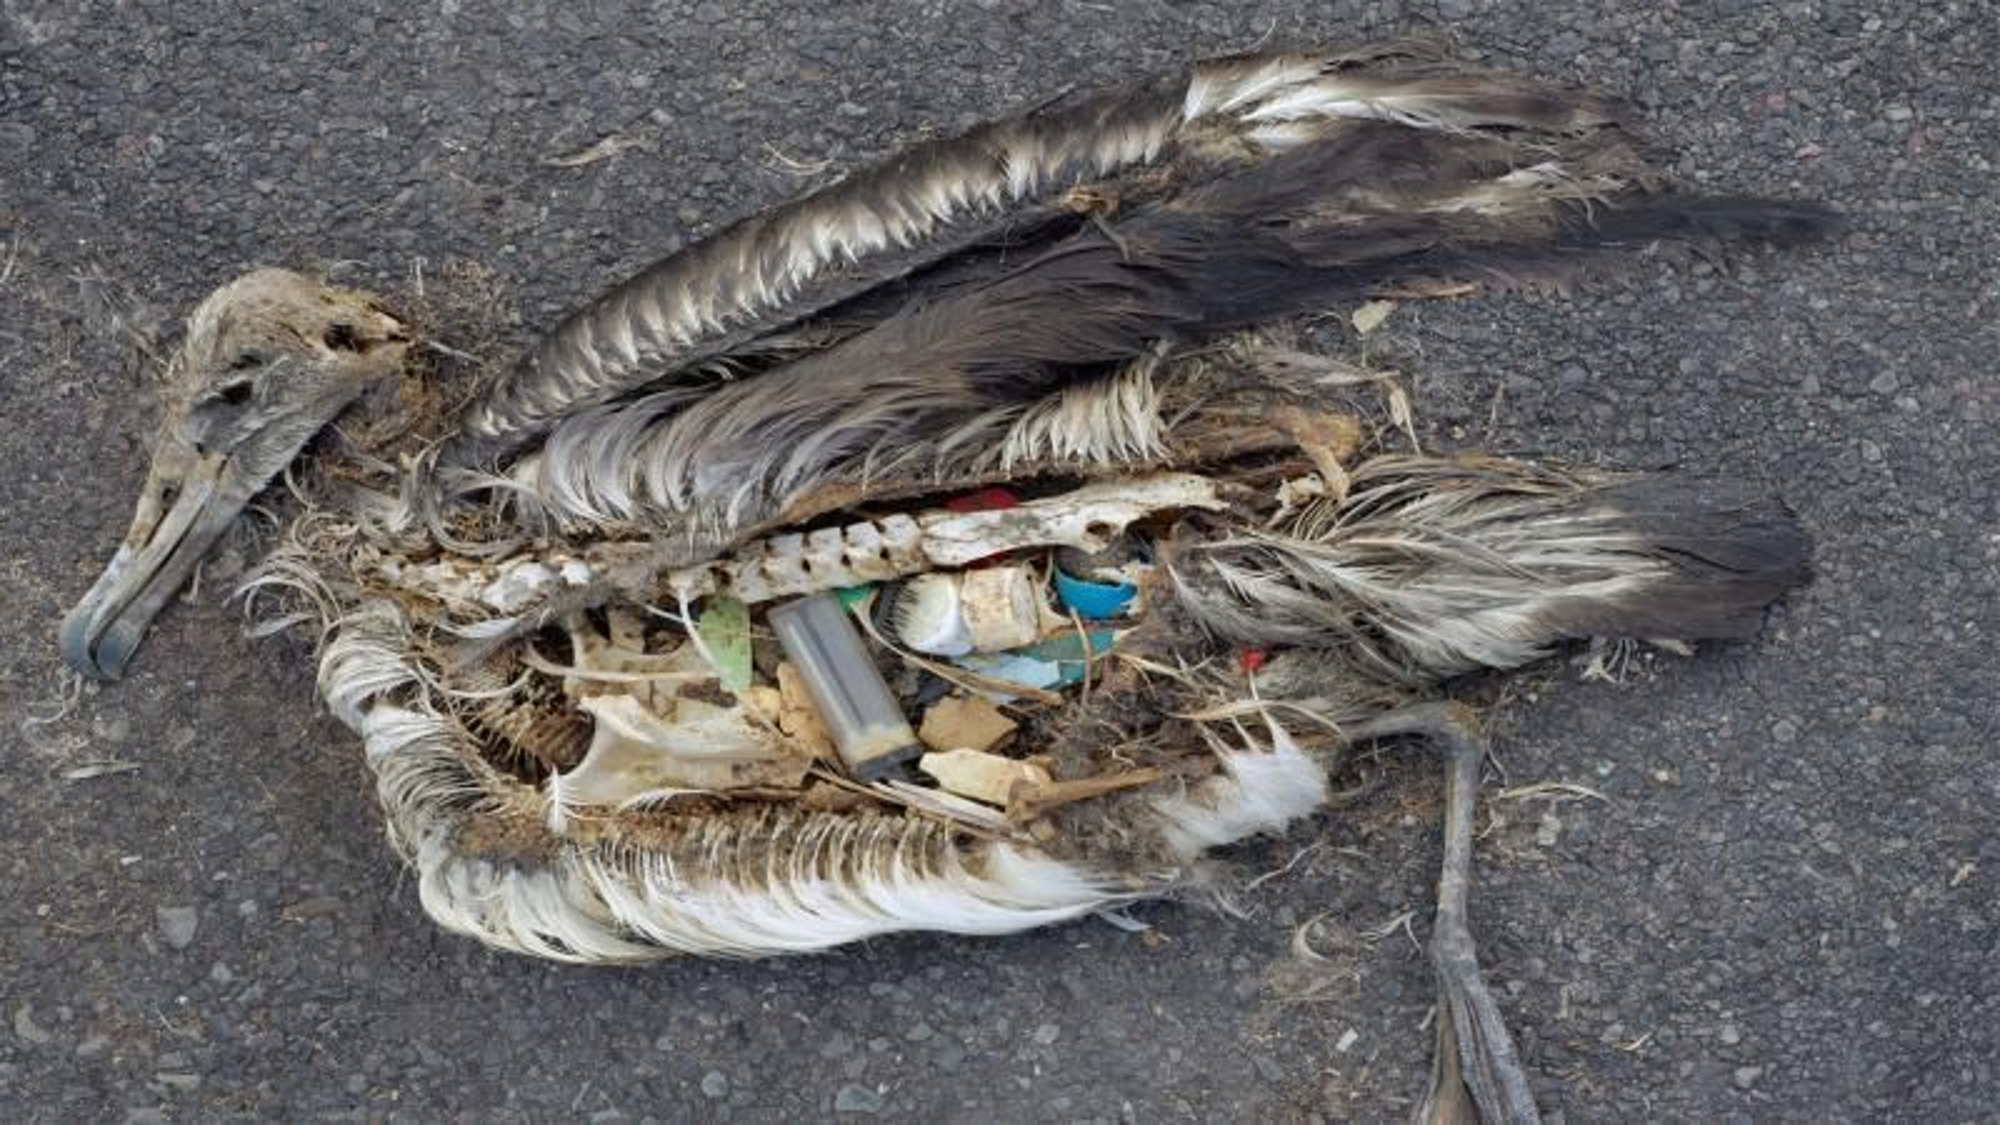 En australsk forskergruppe har undersøkt 1733 fuglekadavere.